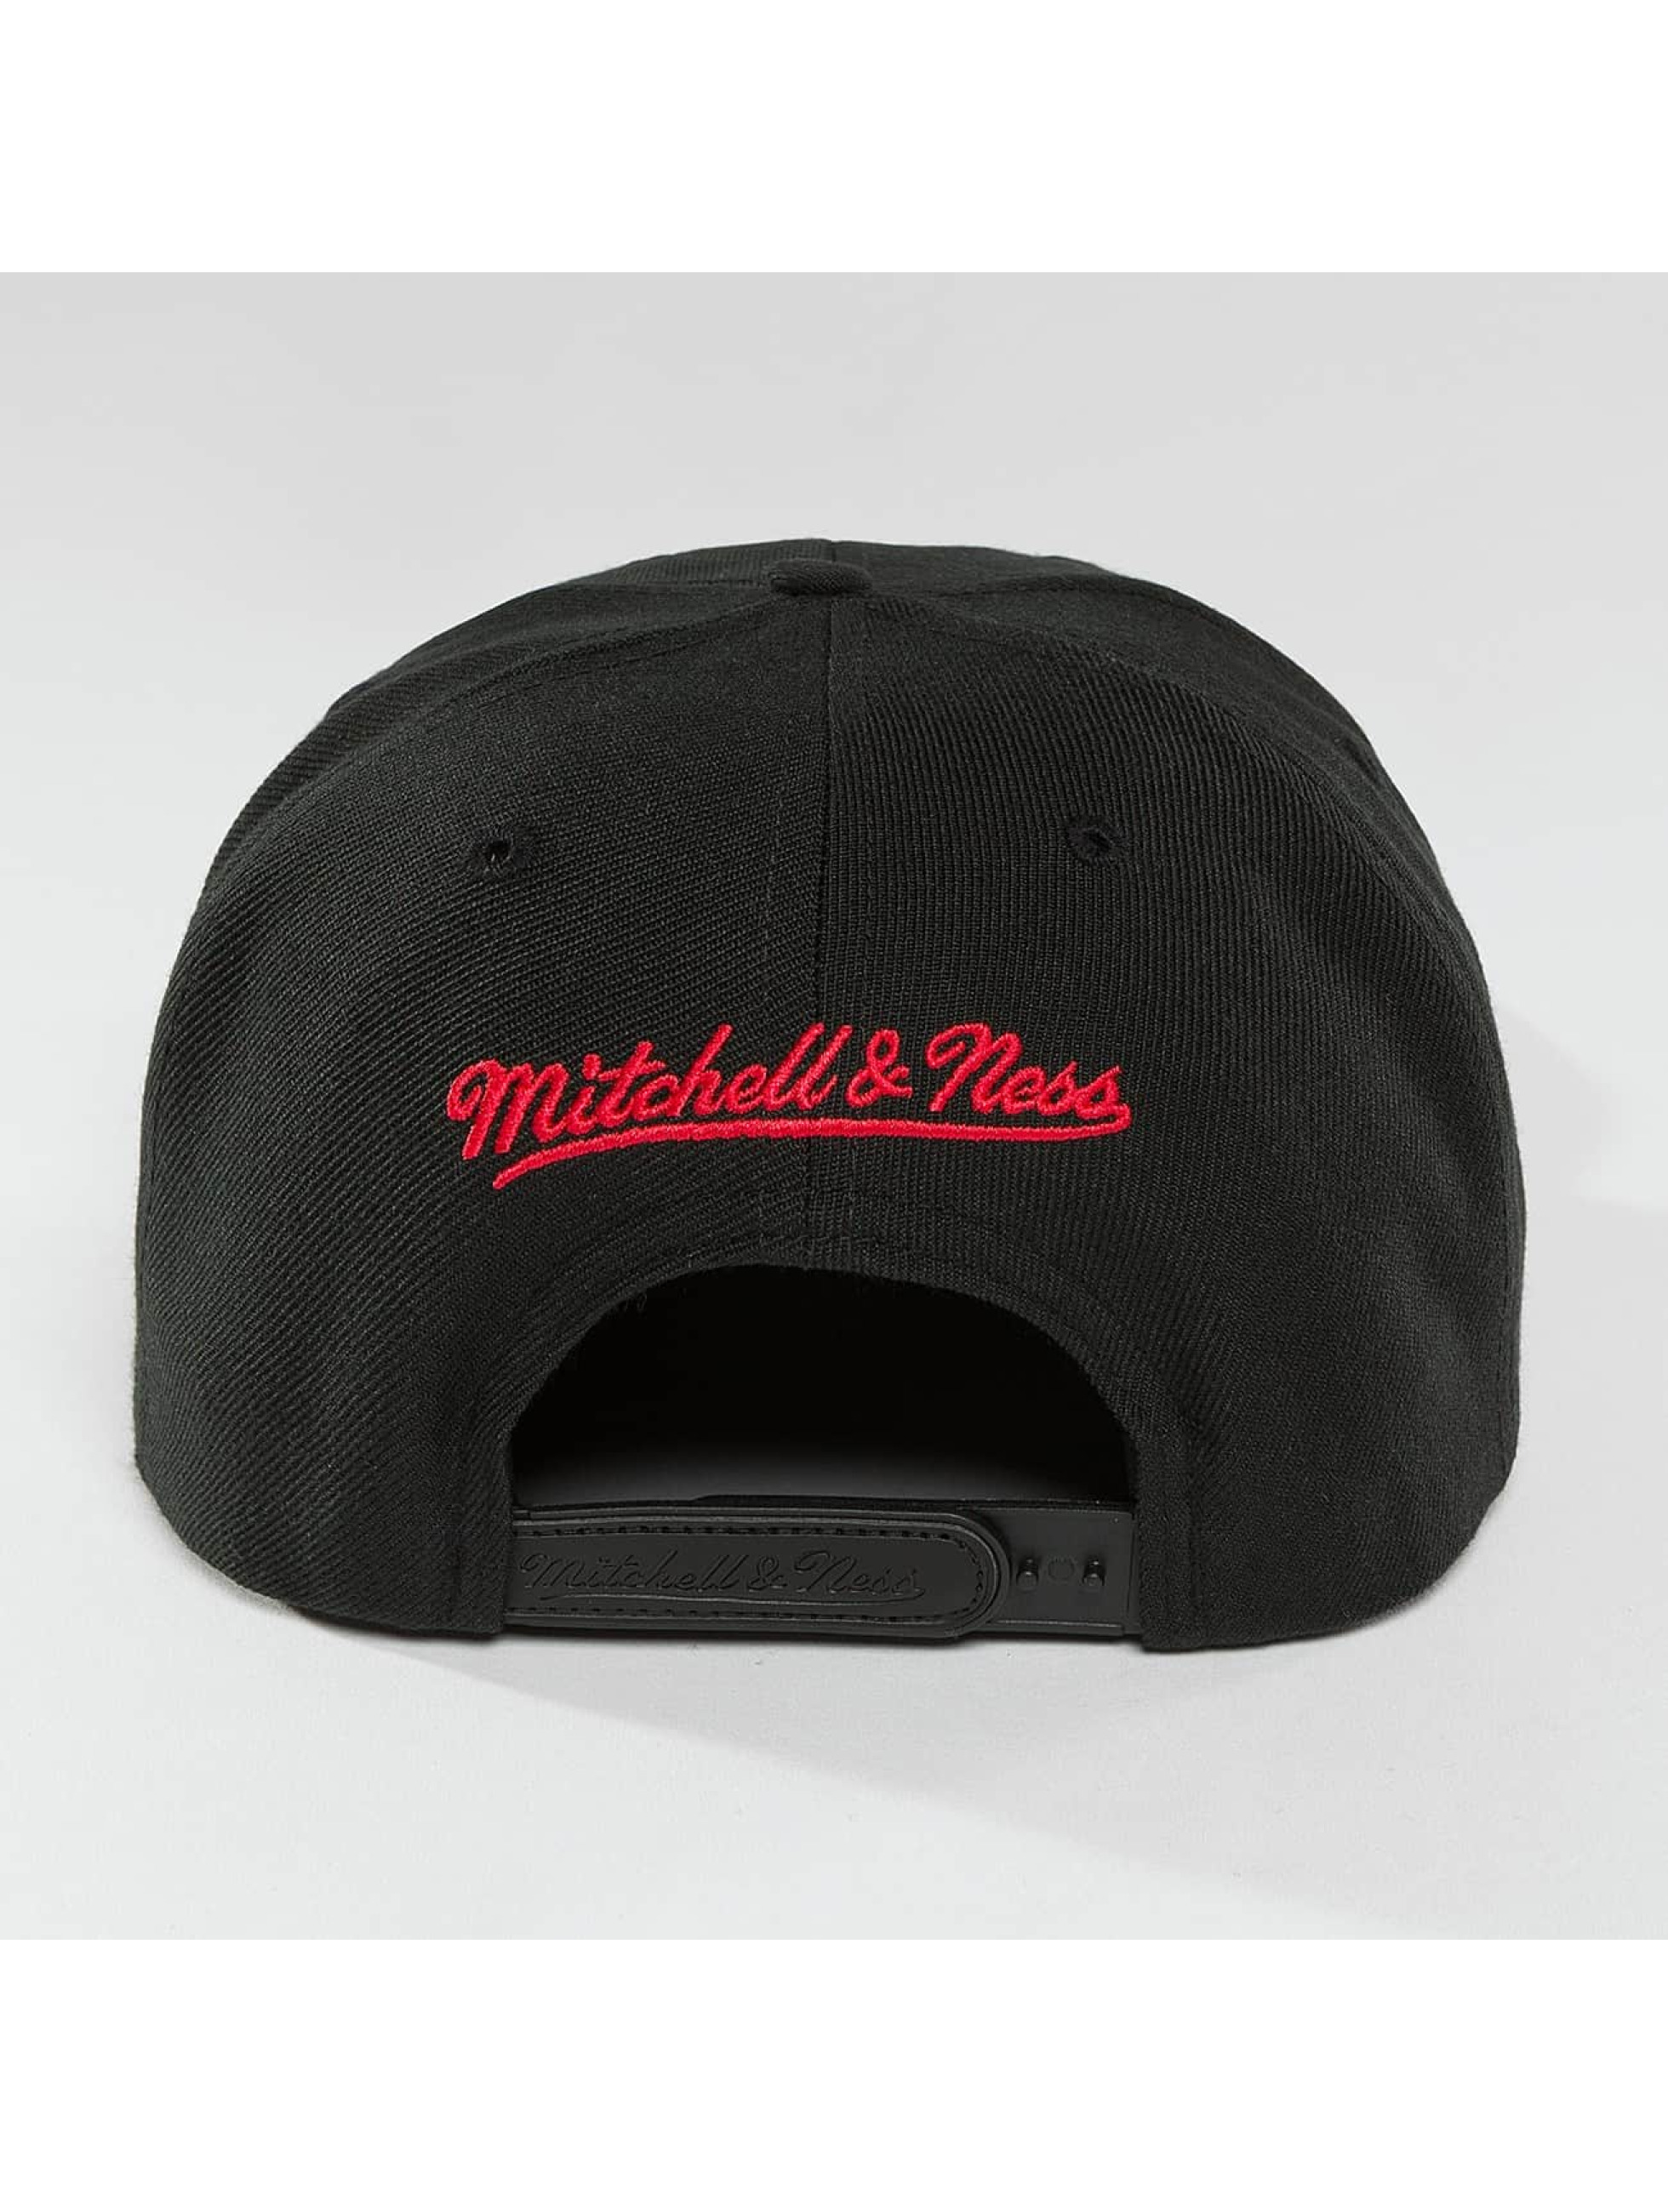 Mitchell & Ness Casquette Snapback & Strapback Red Pop Interlocked noir